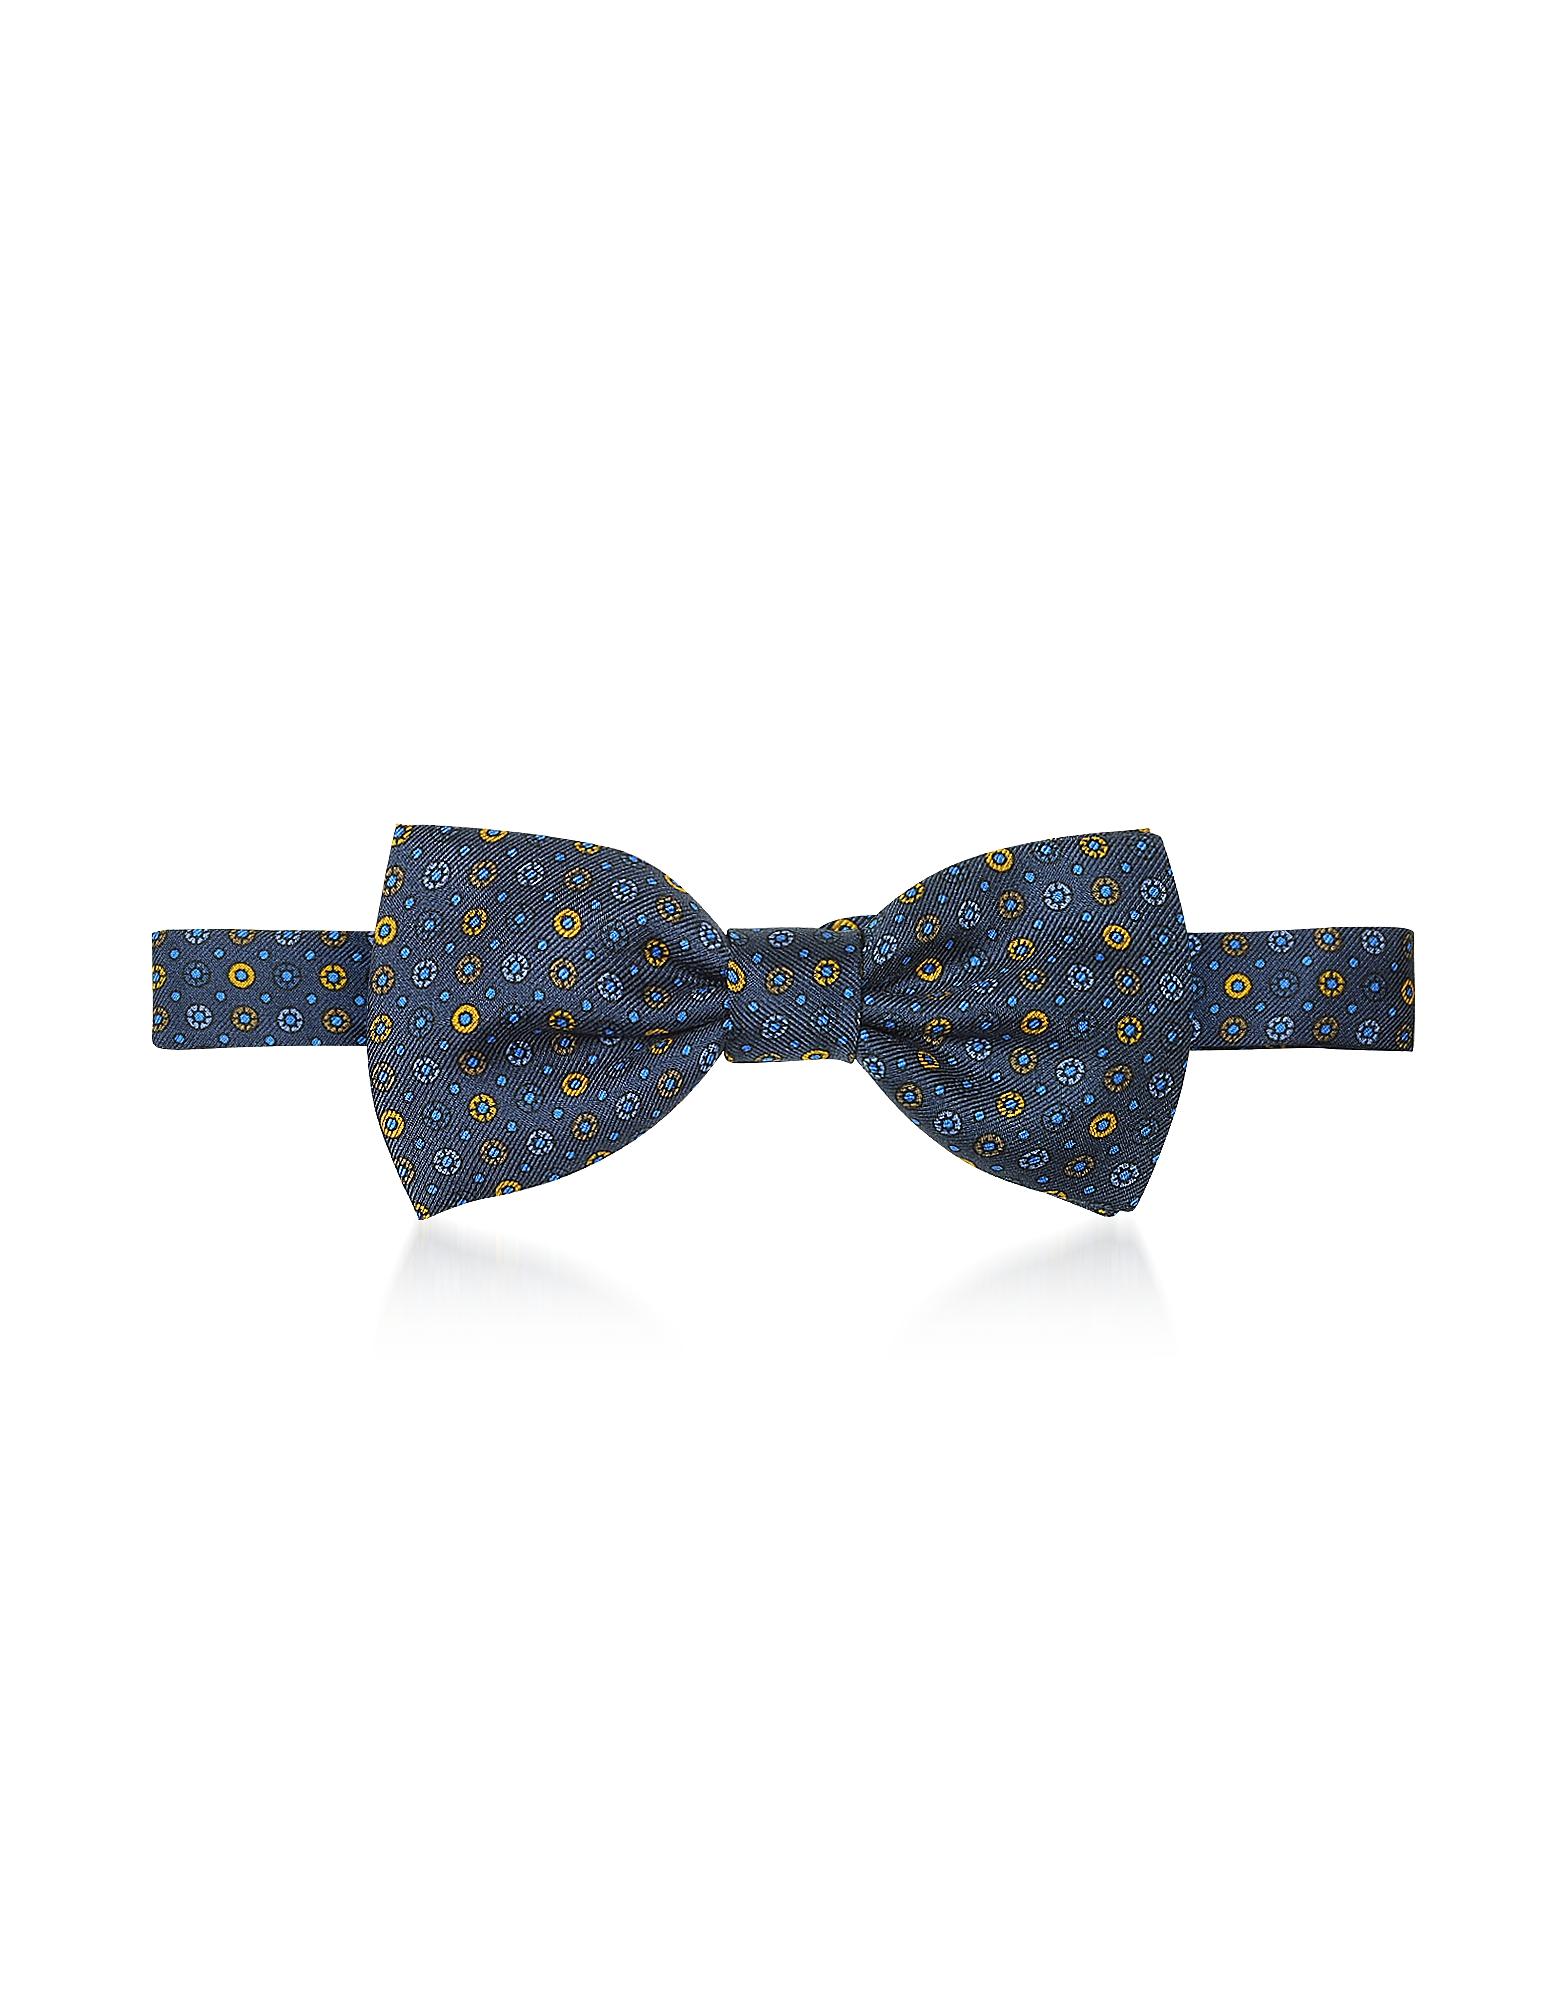 Forzieri Designer Bowties and Cummerbunds, Blue/Gold Floral & Dots Print Silk Pre-Tied Bow Tie